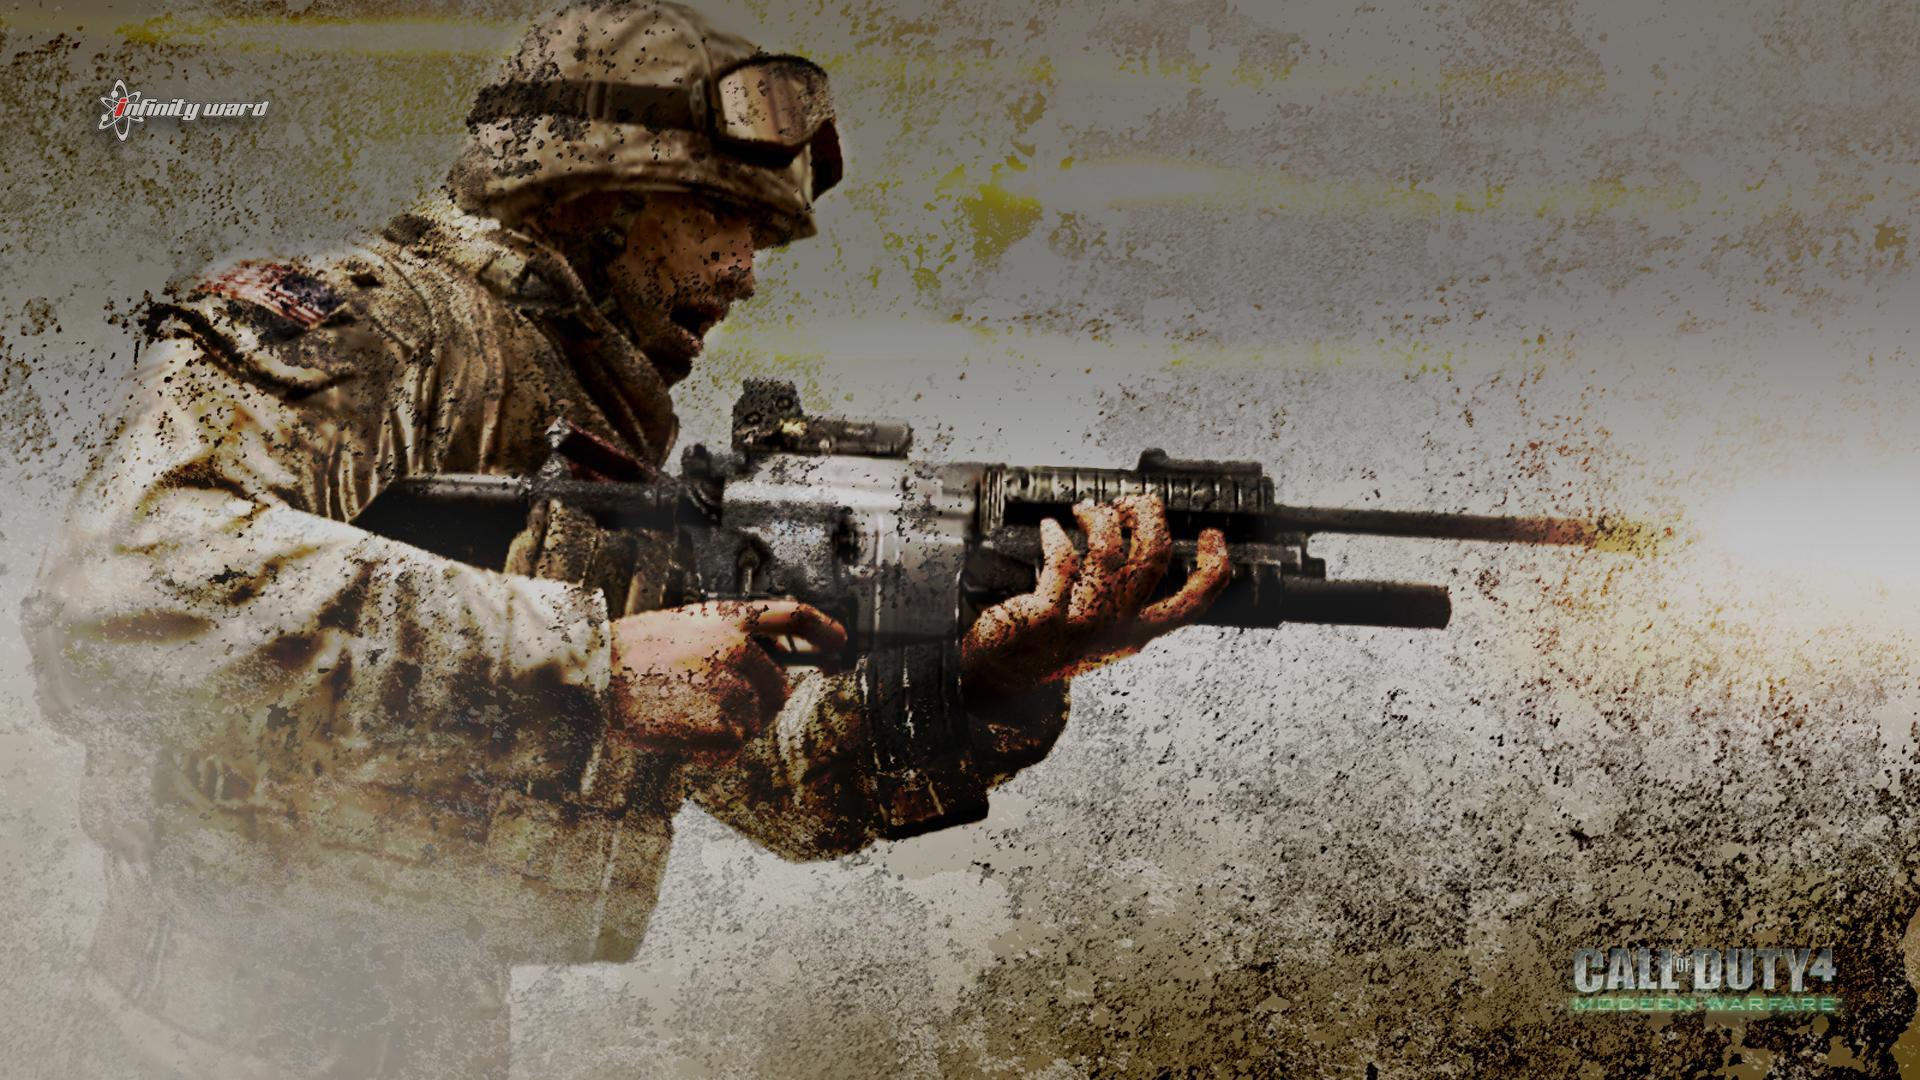 Call Of Duty 4: Modern Warfare HD Wallpaper | Background ...